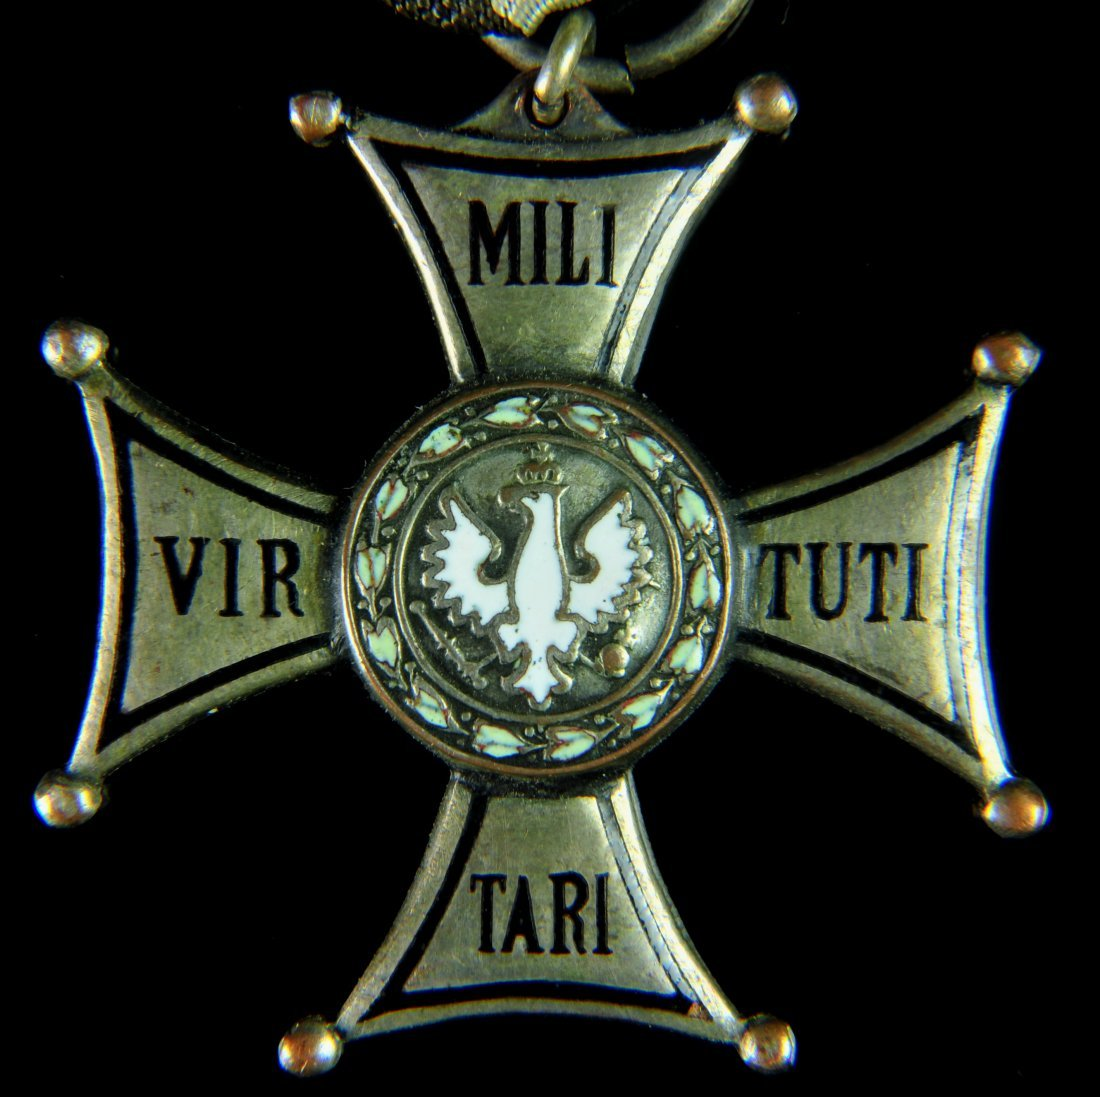 A POLISH ORDER VIRTUTI MILITARI, POLAND 1918-1939 - 4